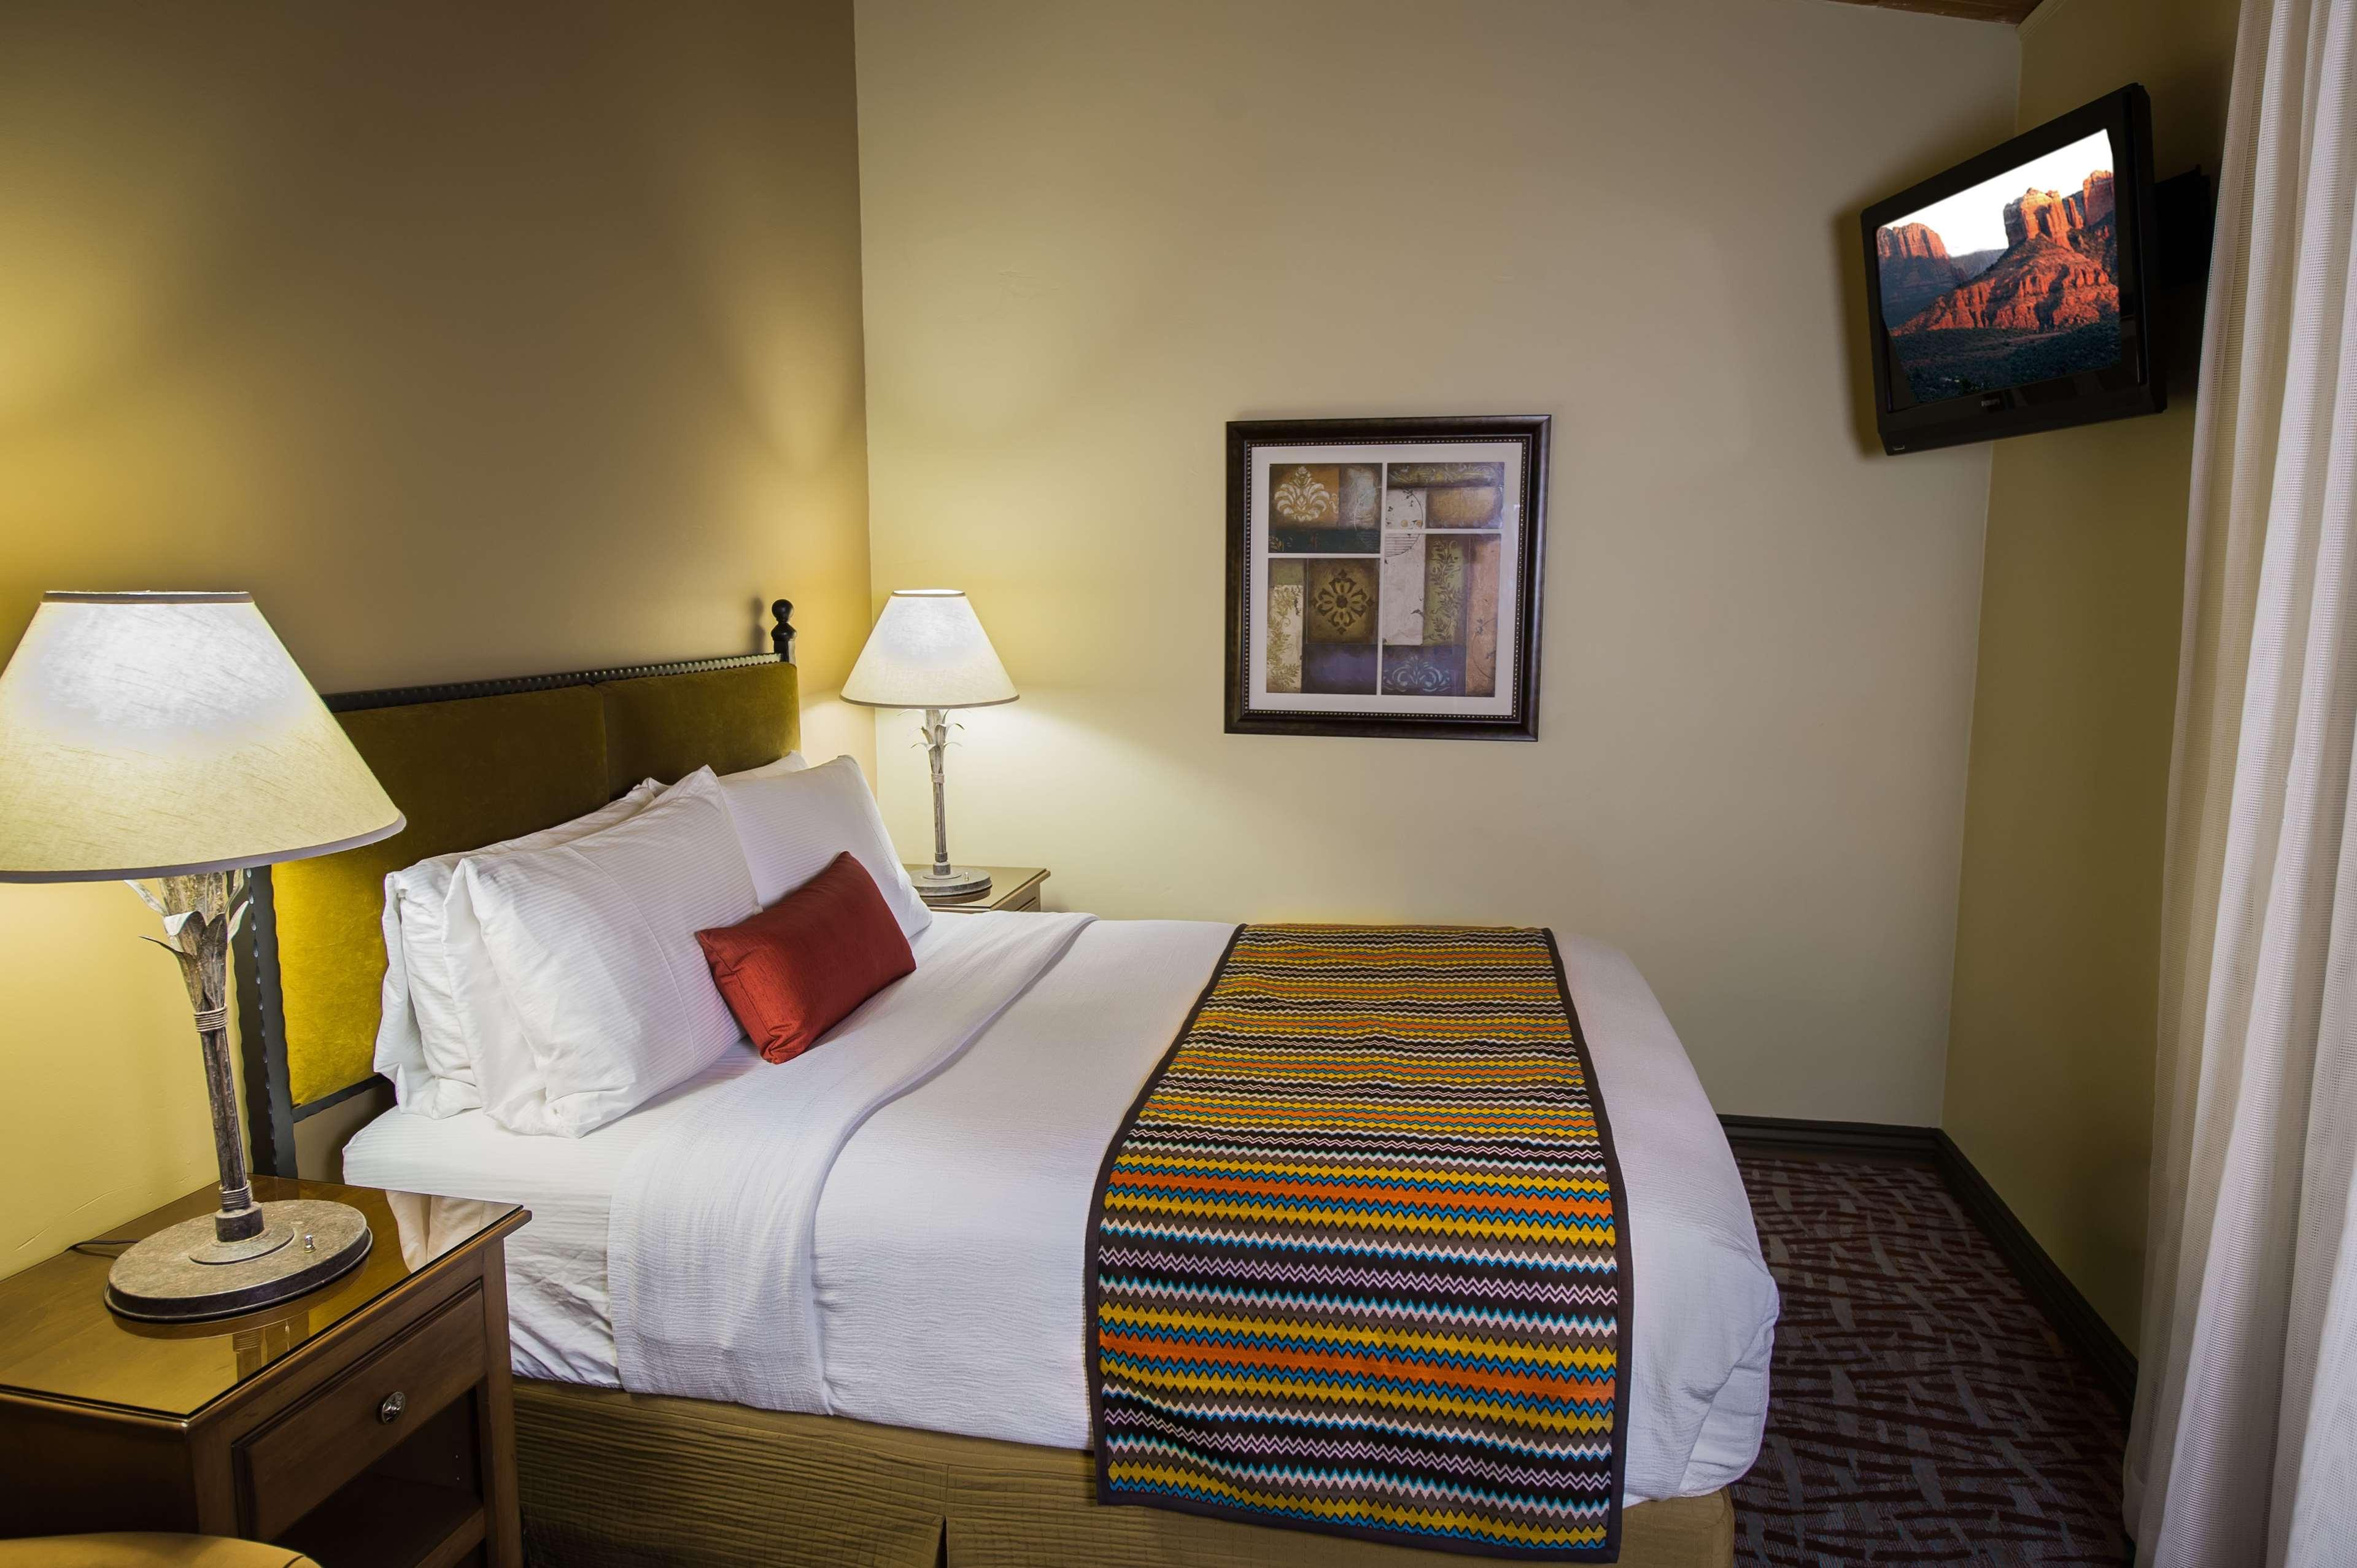 Best Western Plus Arroyo Roble Hotel & Creekside Villas image 32